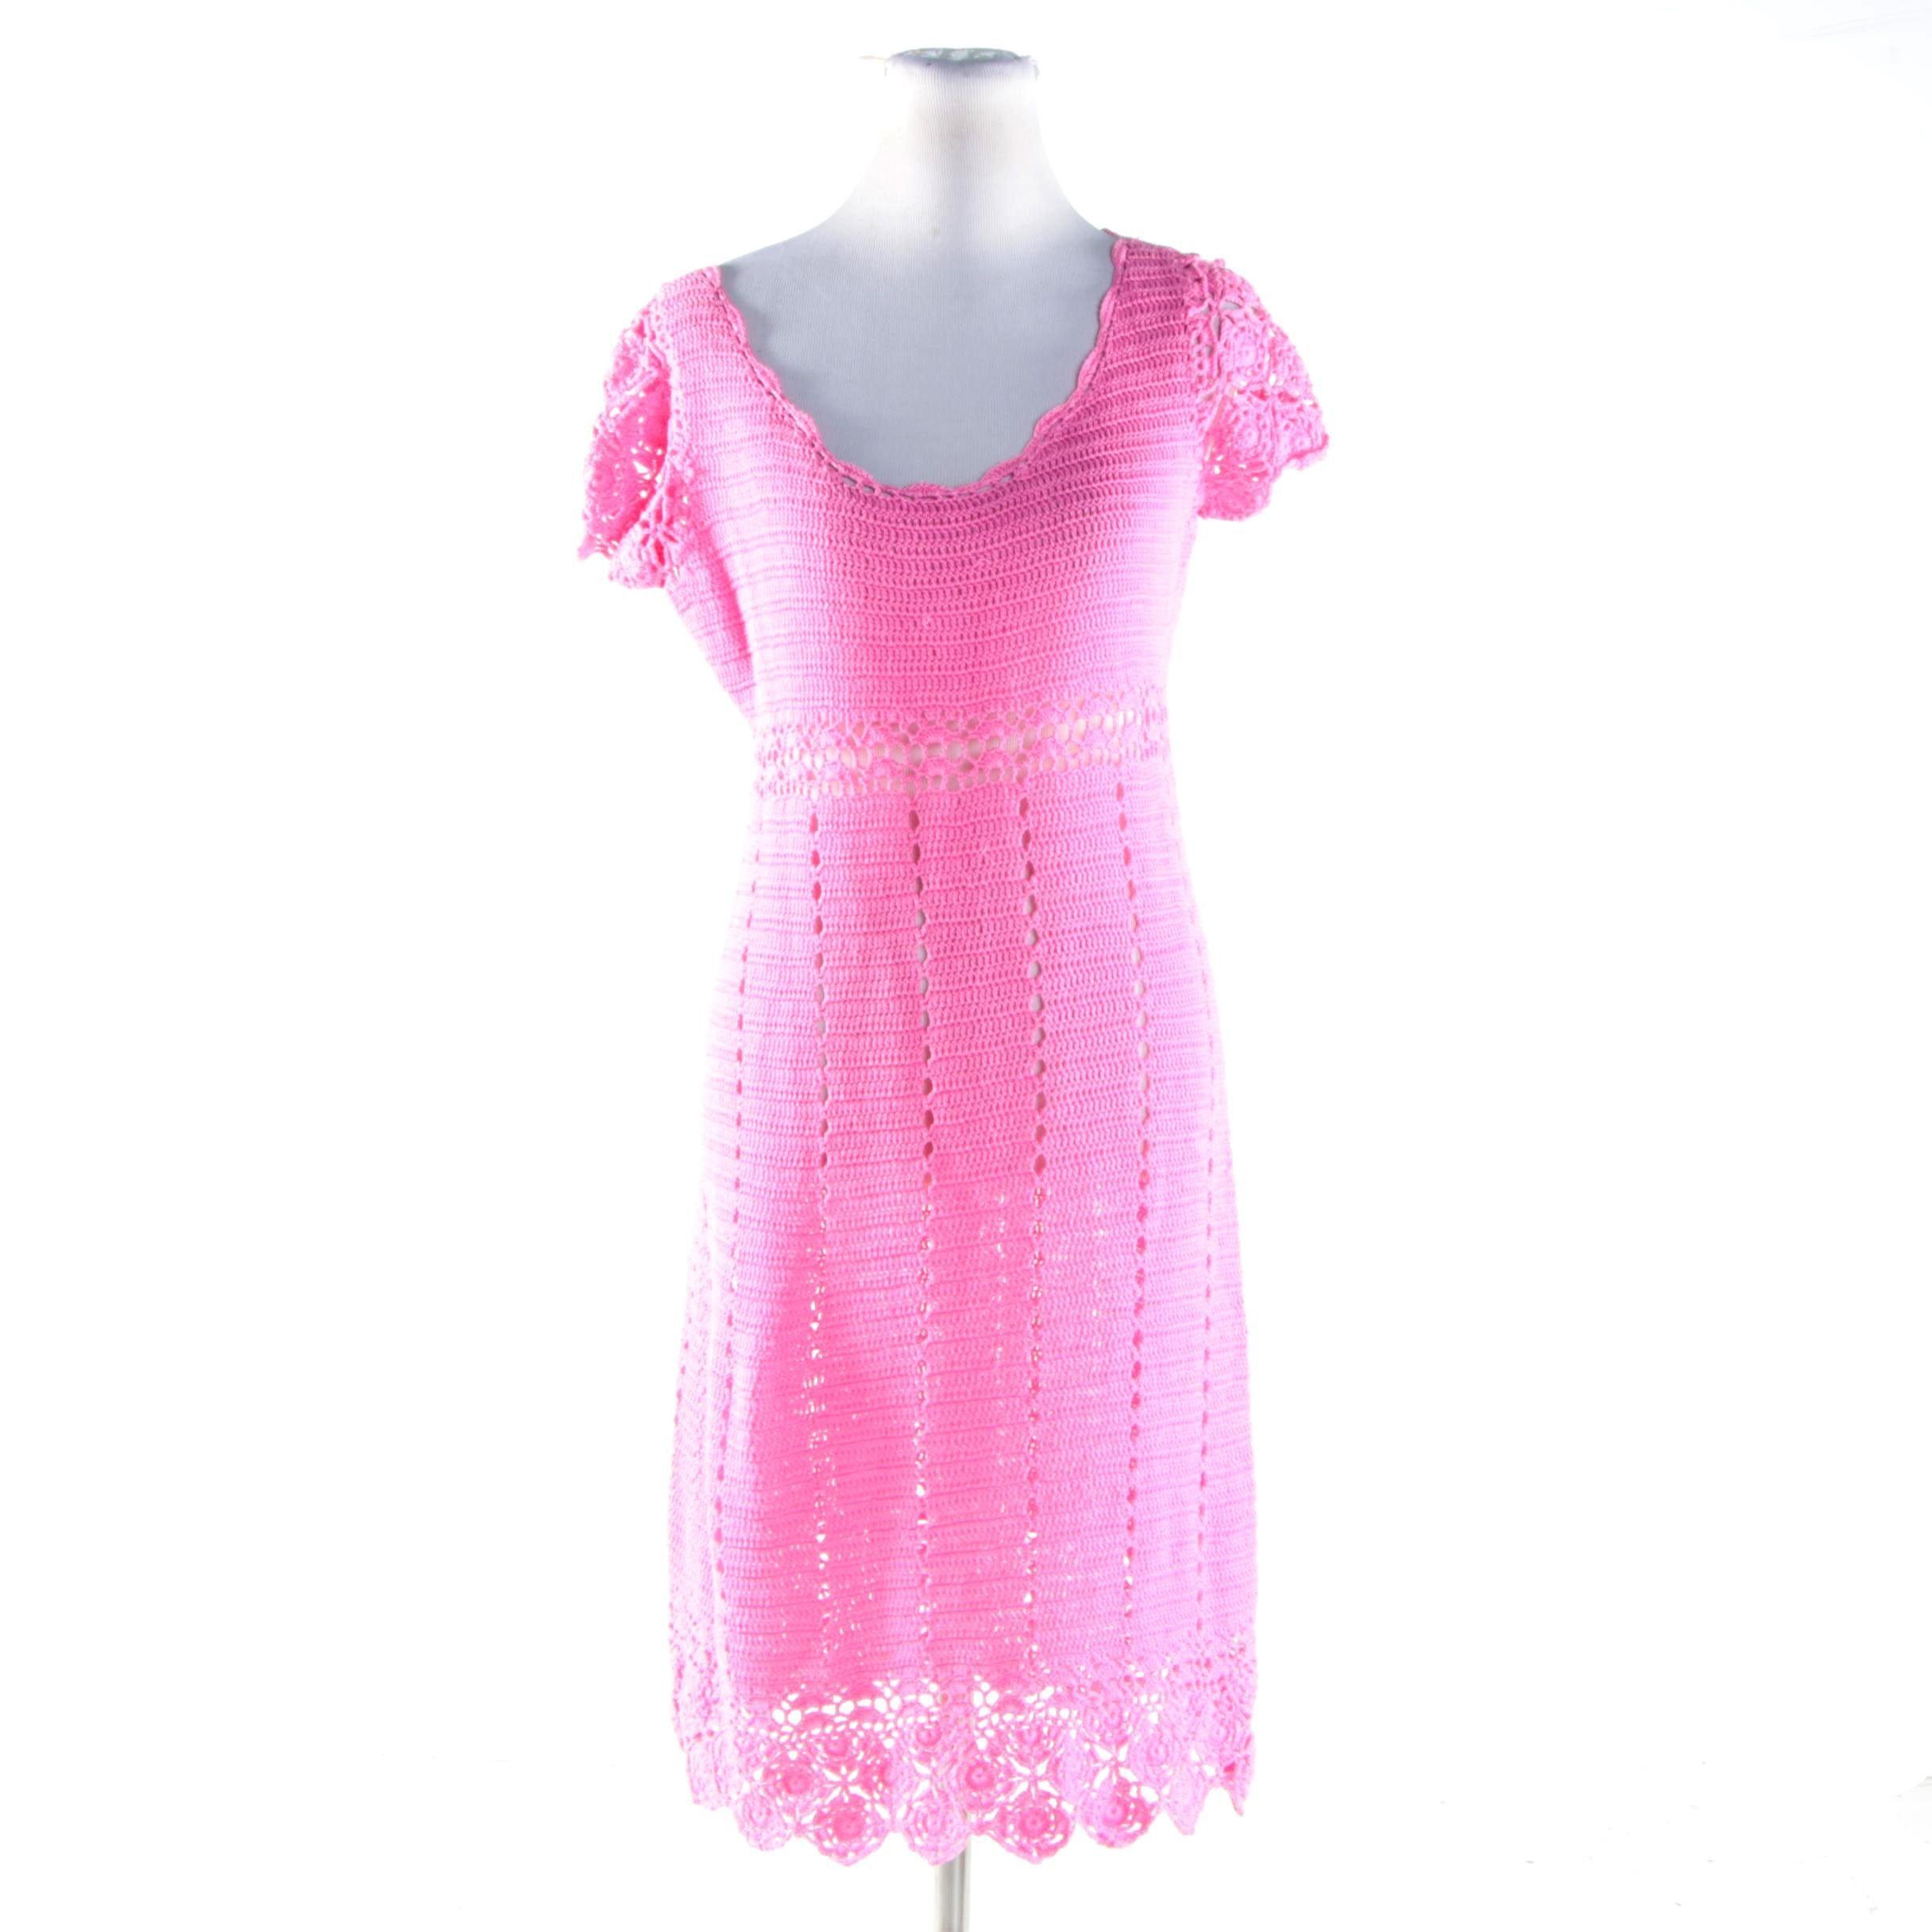 Lilly Pulitzer Pink Crochet Dress